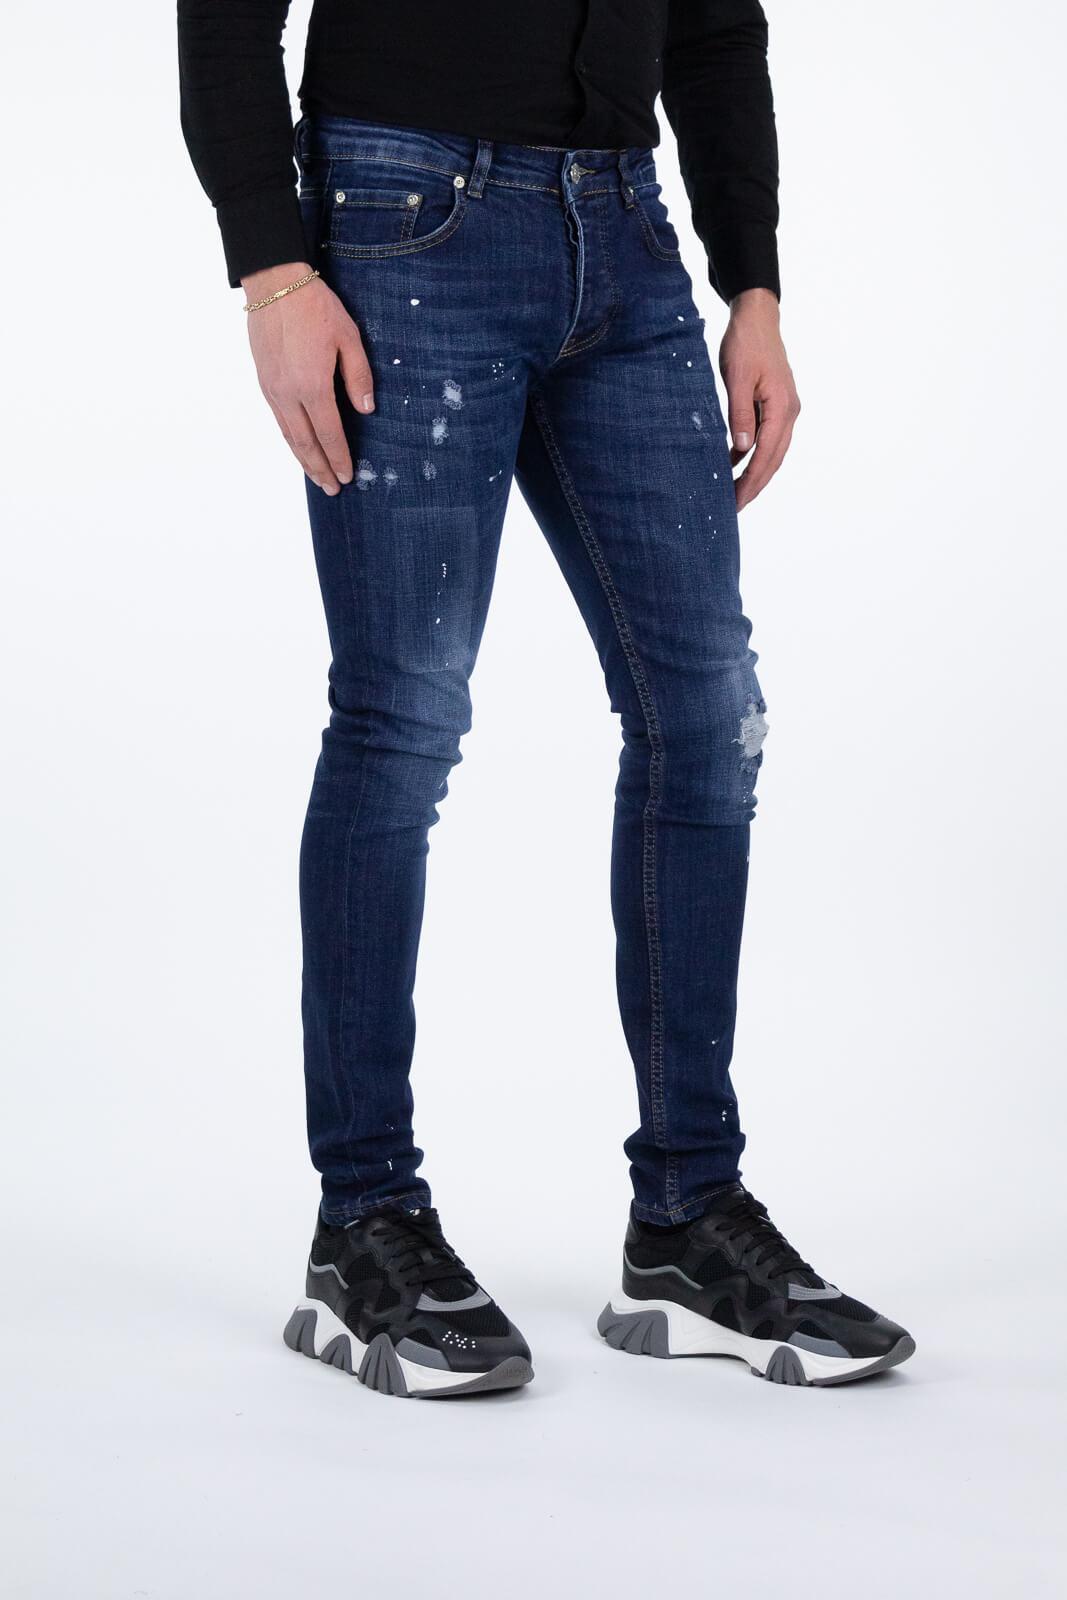 Talara Bleu Jeans-2